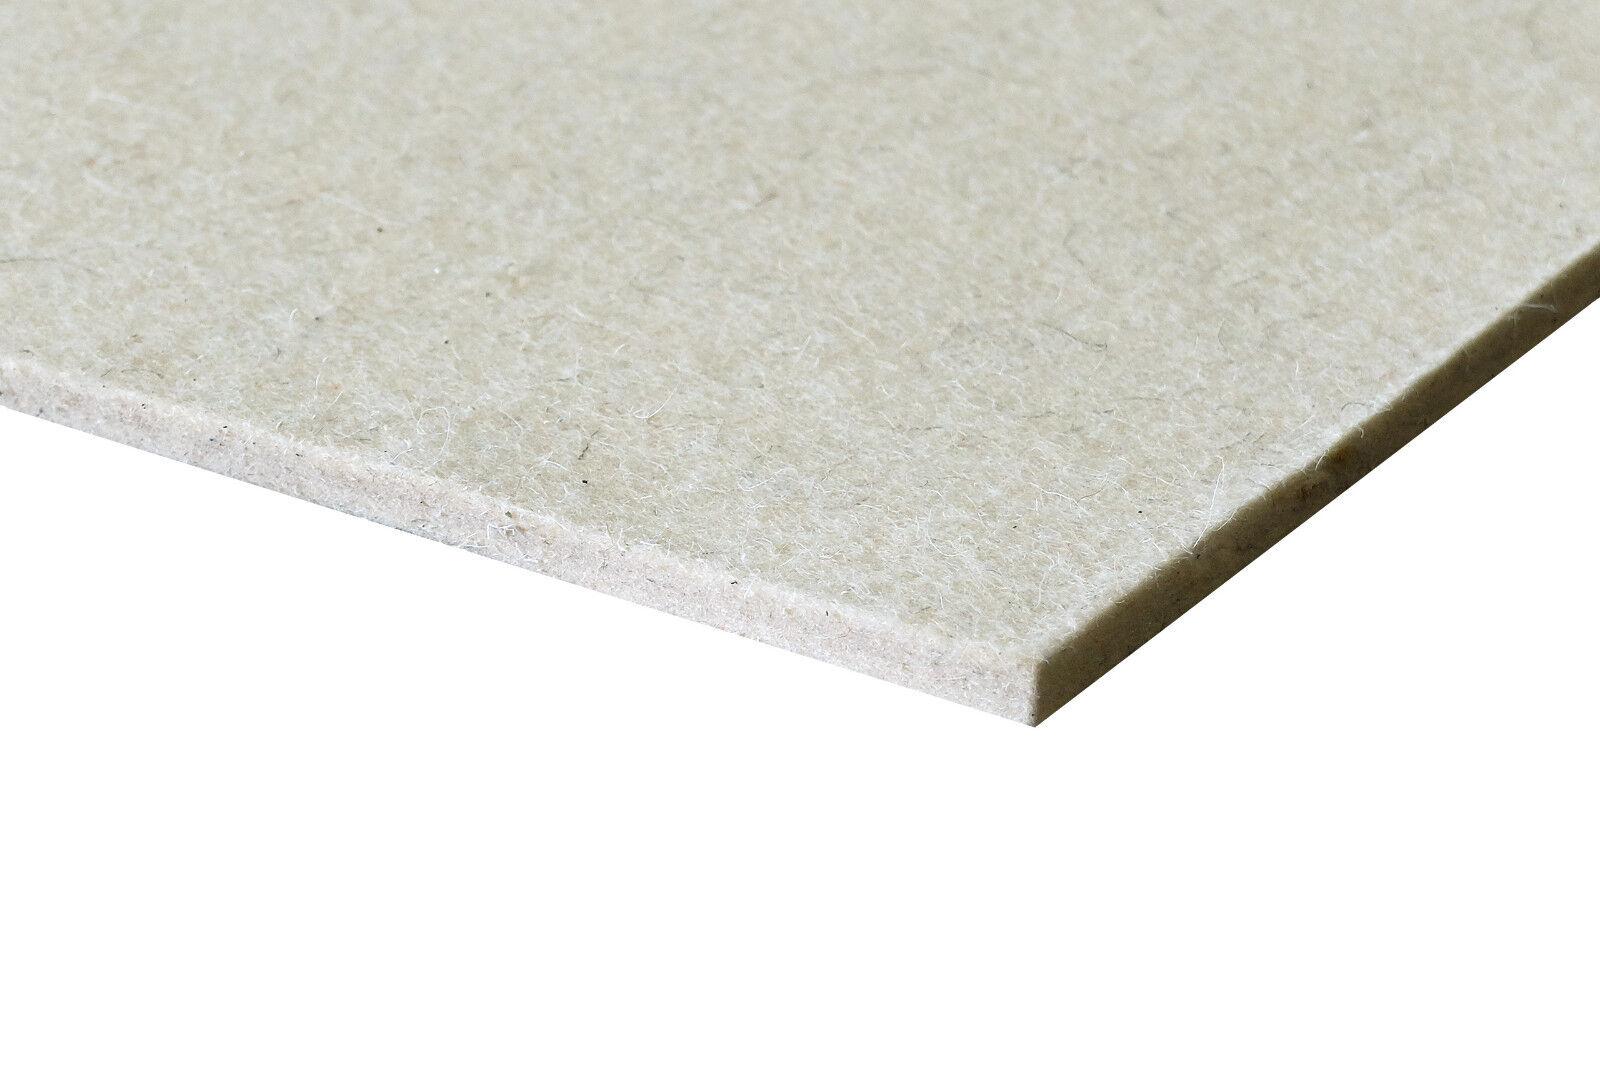 Wollfilz 2 15 mm Weiß Beige Filzmatte Filzplatte Industriefilz